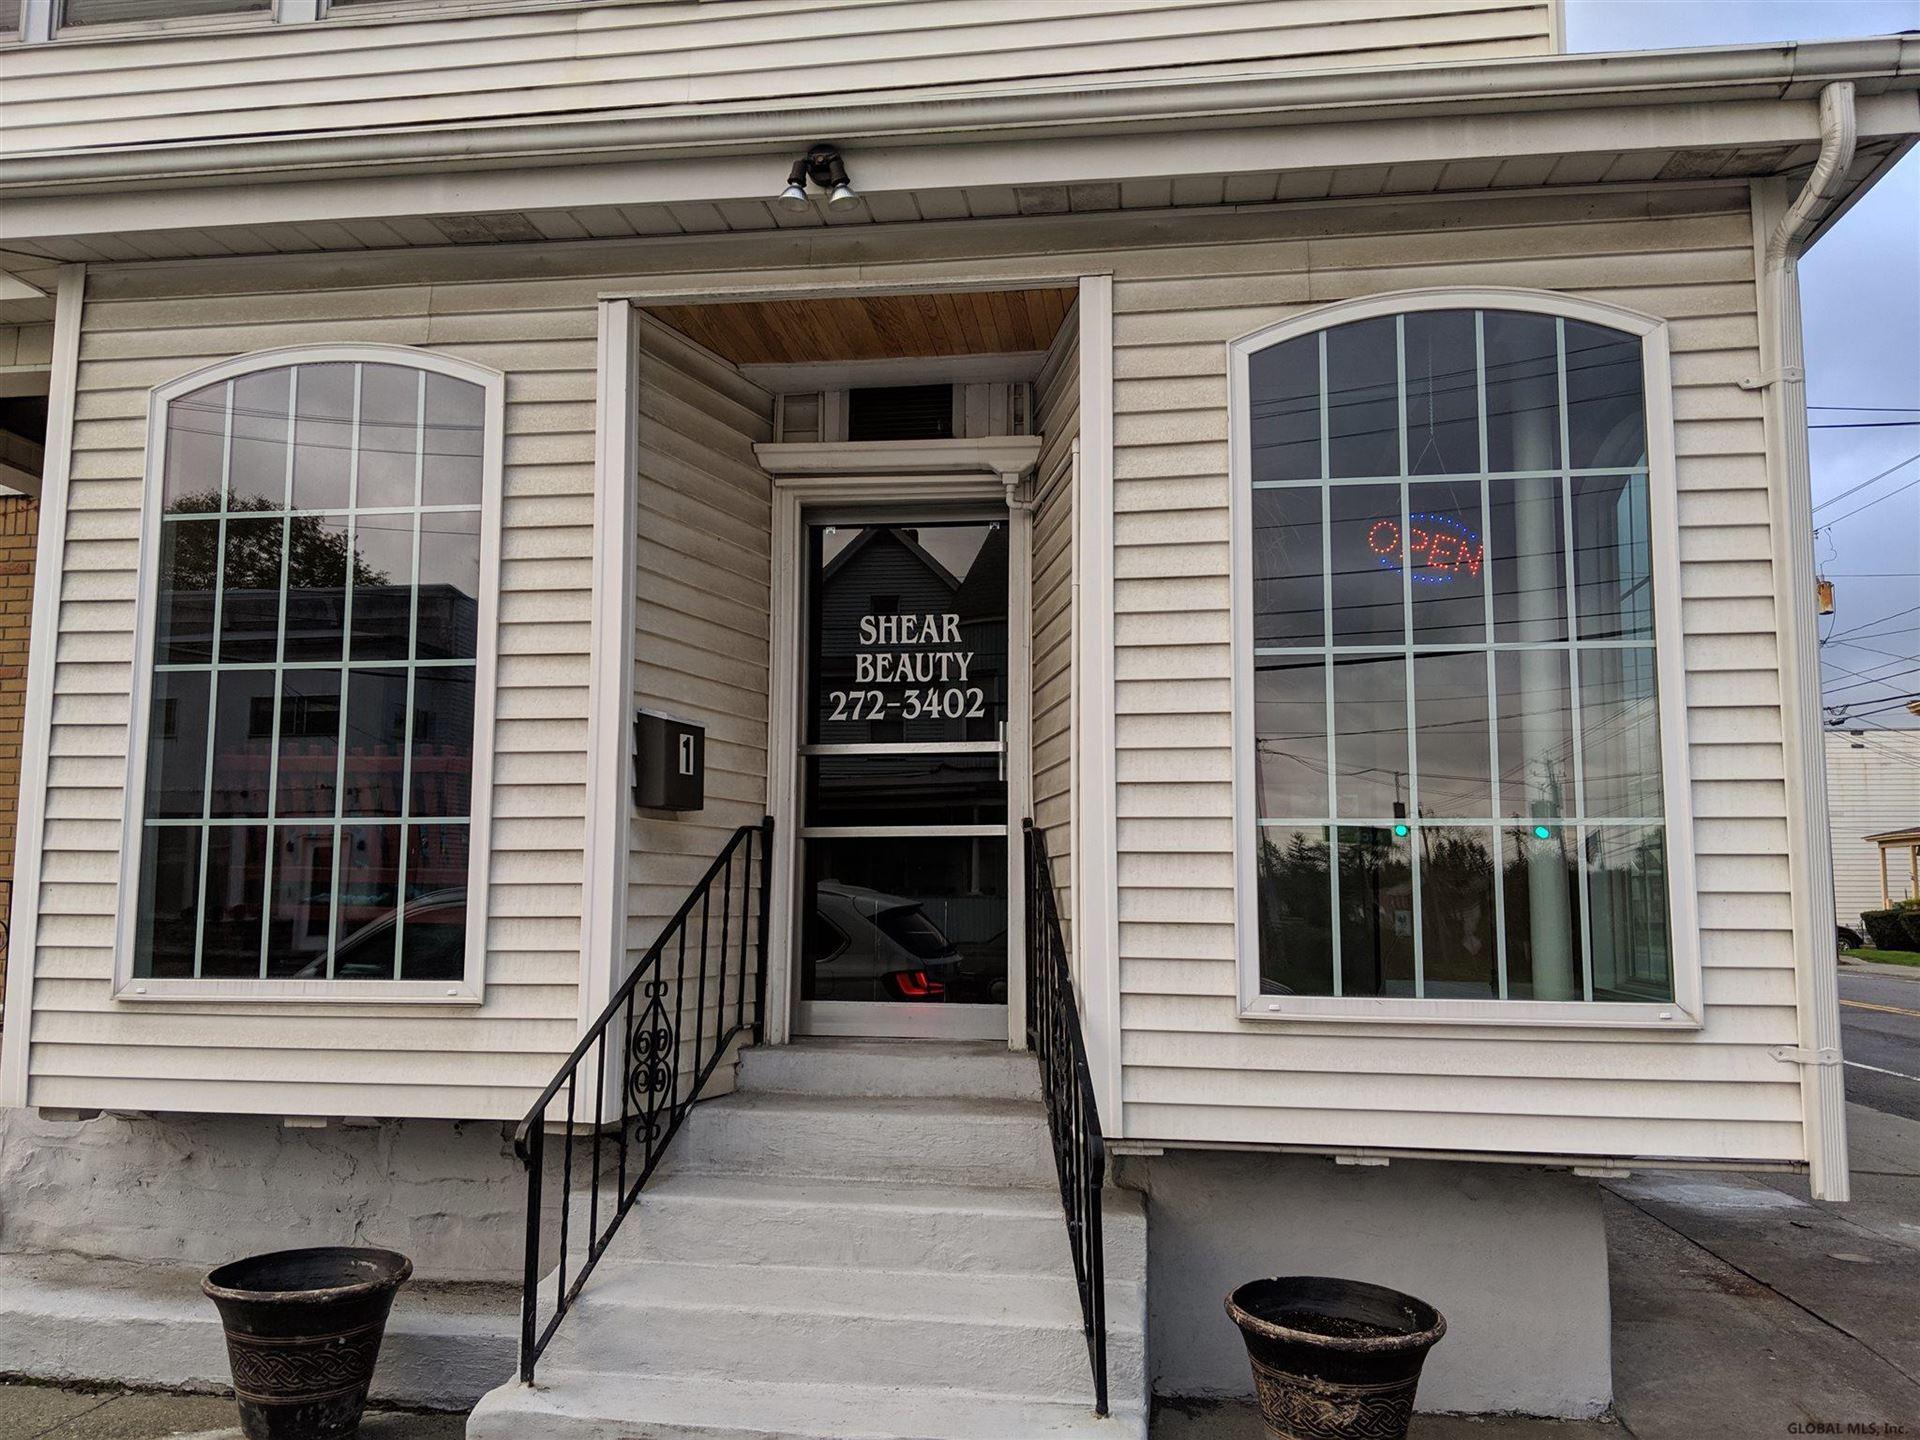 1 ARCH ST, Colonie, NY 12189 - #: 202112968